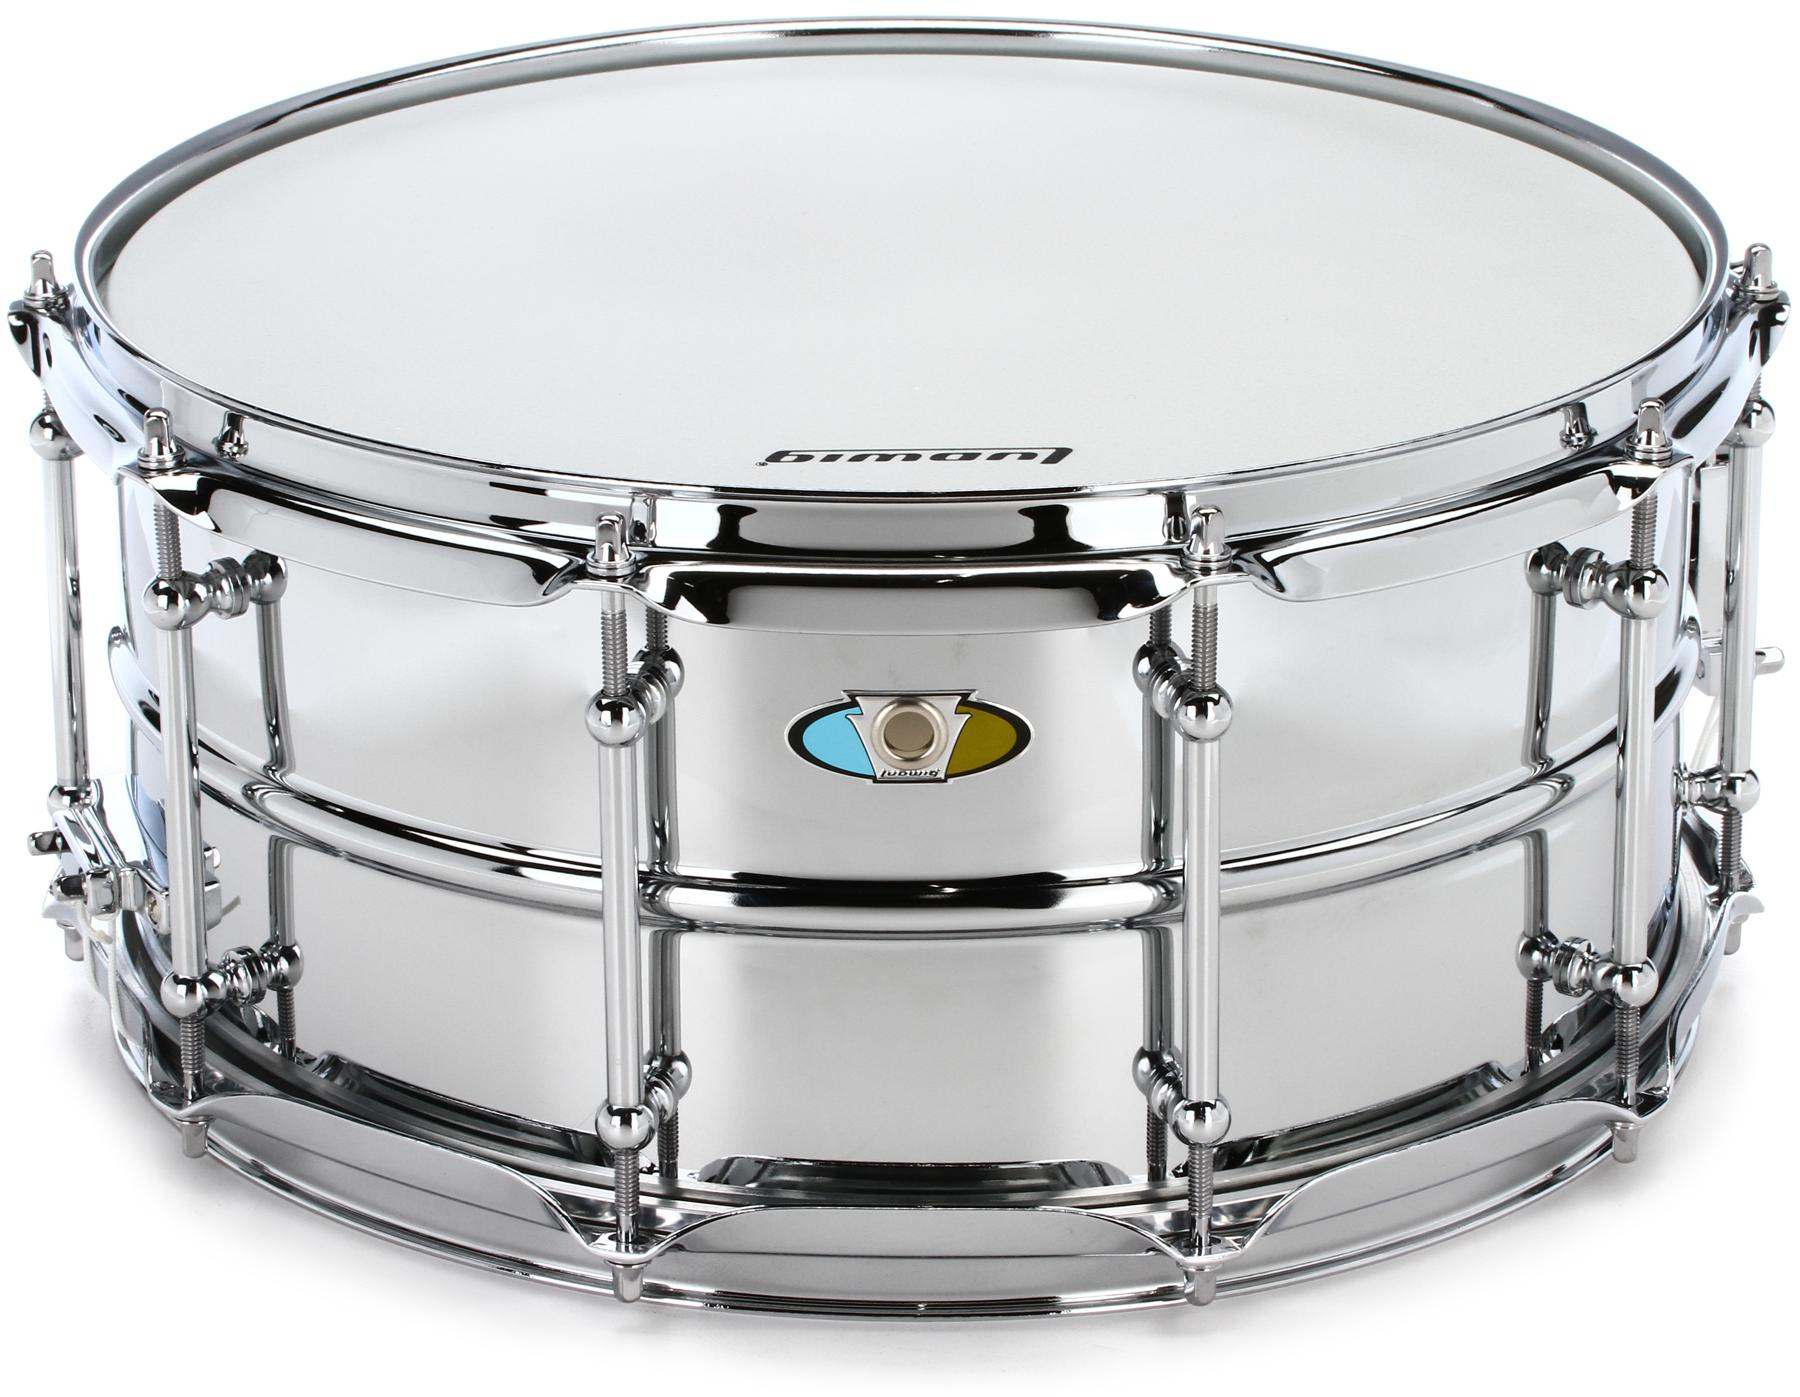 10. Gretsch Drums – Black Copper Snare 14 x 5 in